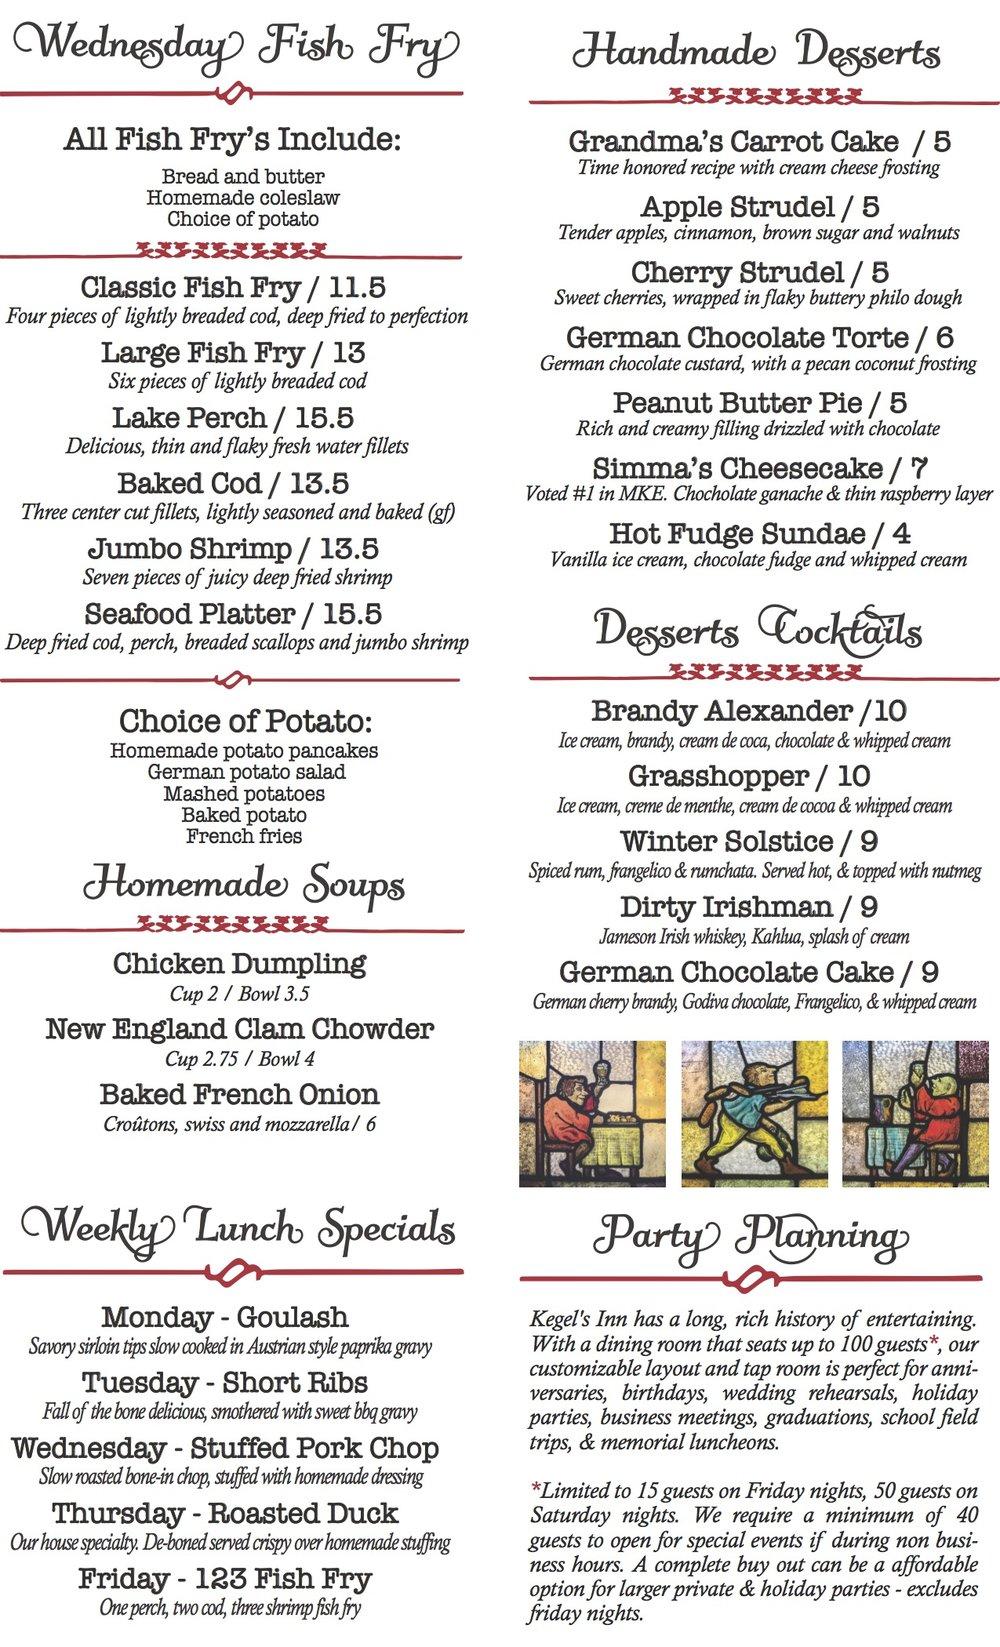 Wednesday fish fry menu.jpg